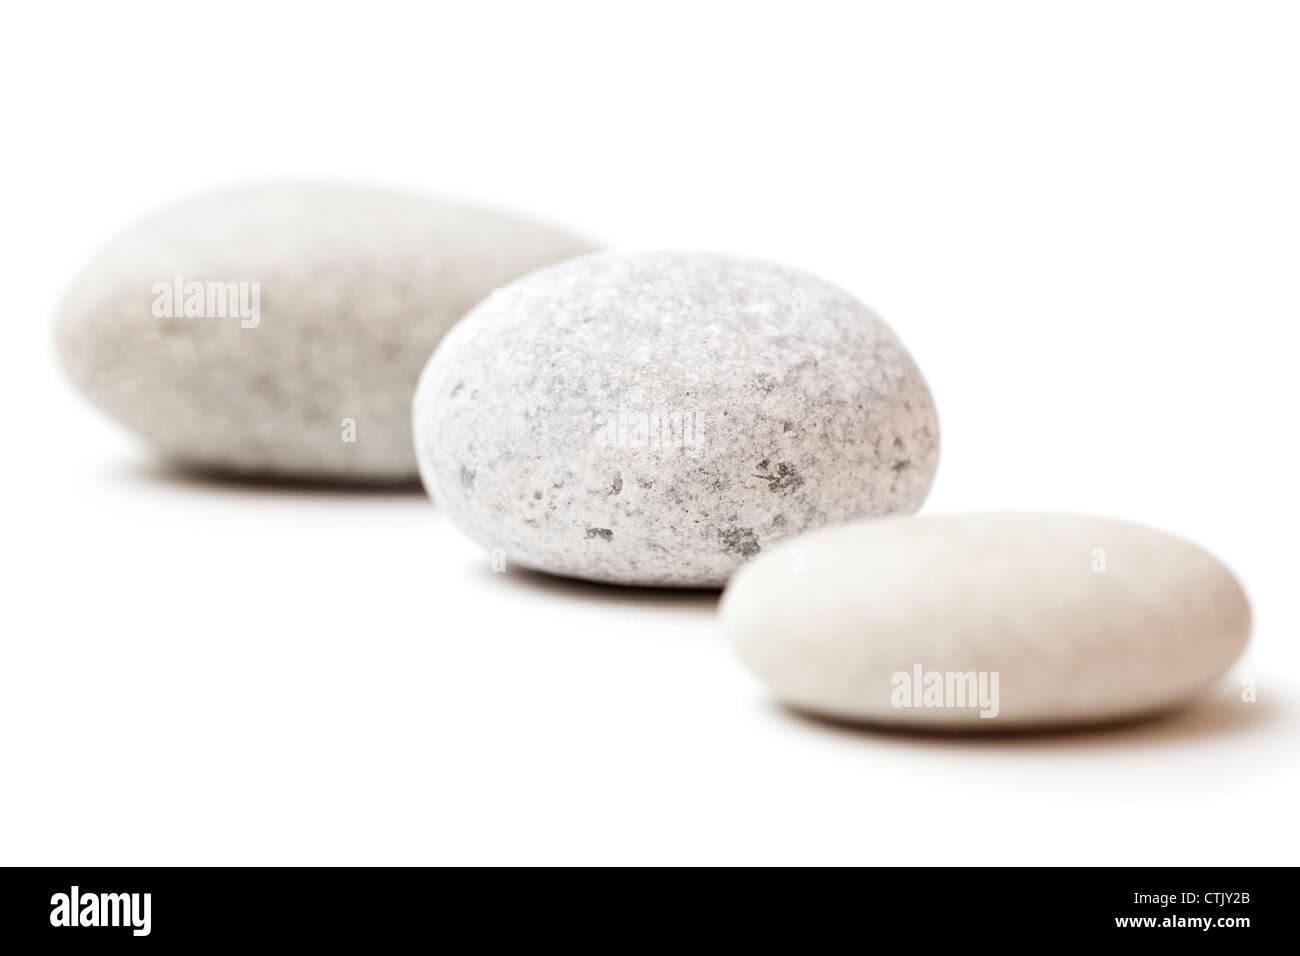 three gray spa stones isolated on white background - Stock Image